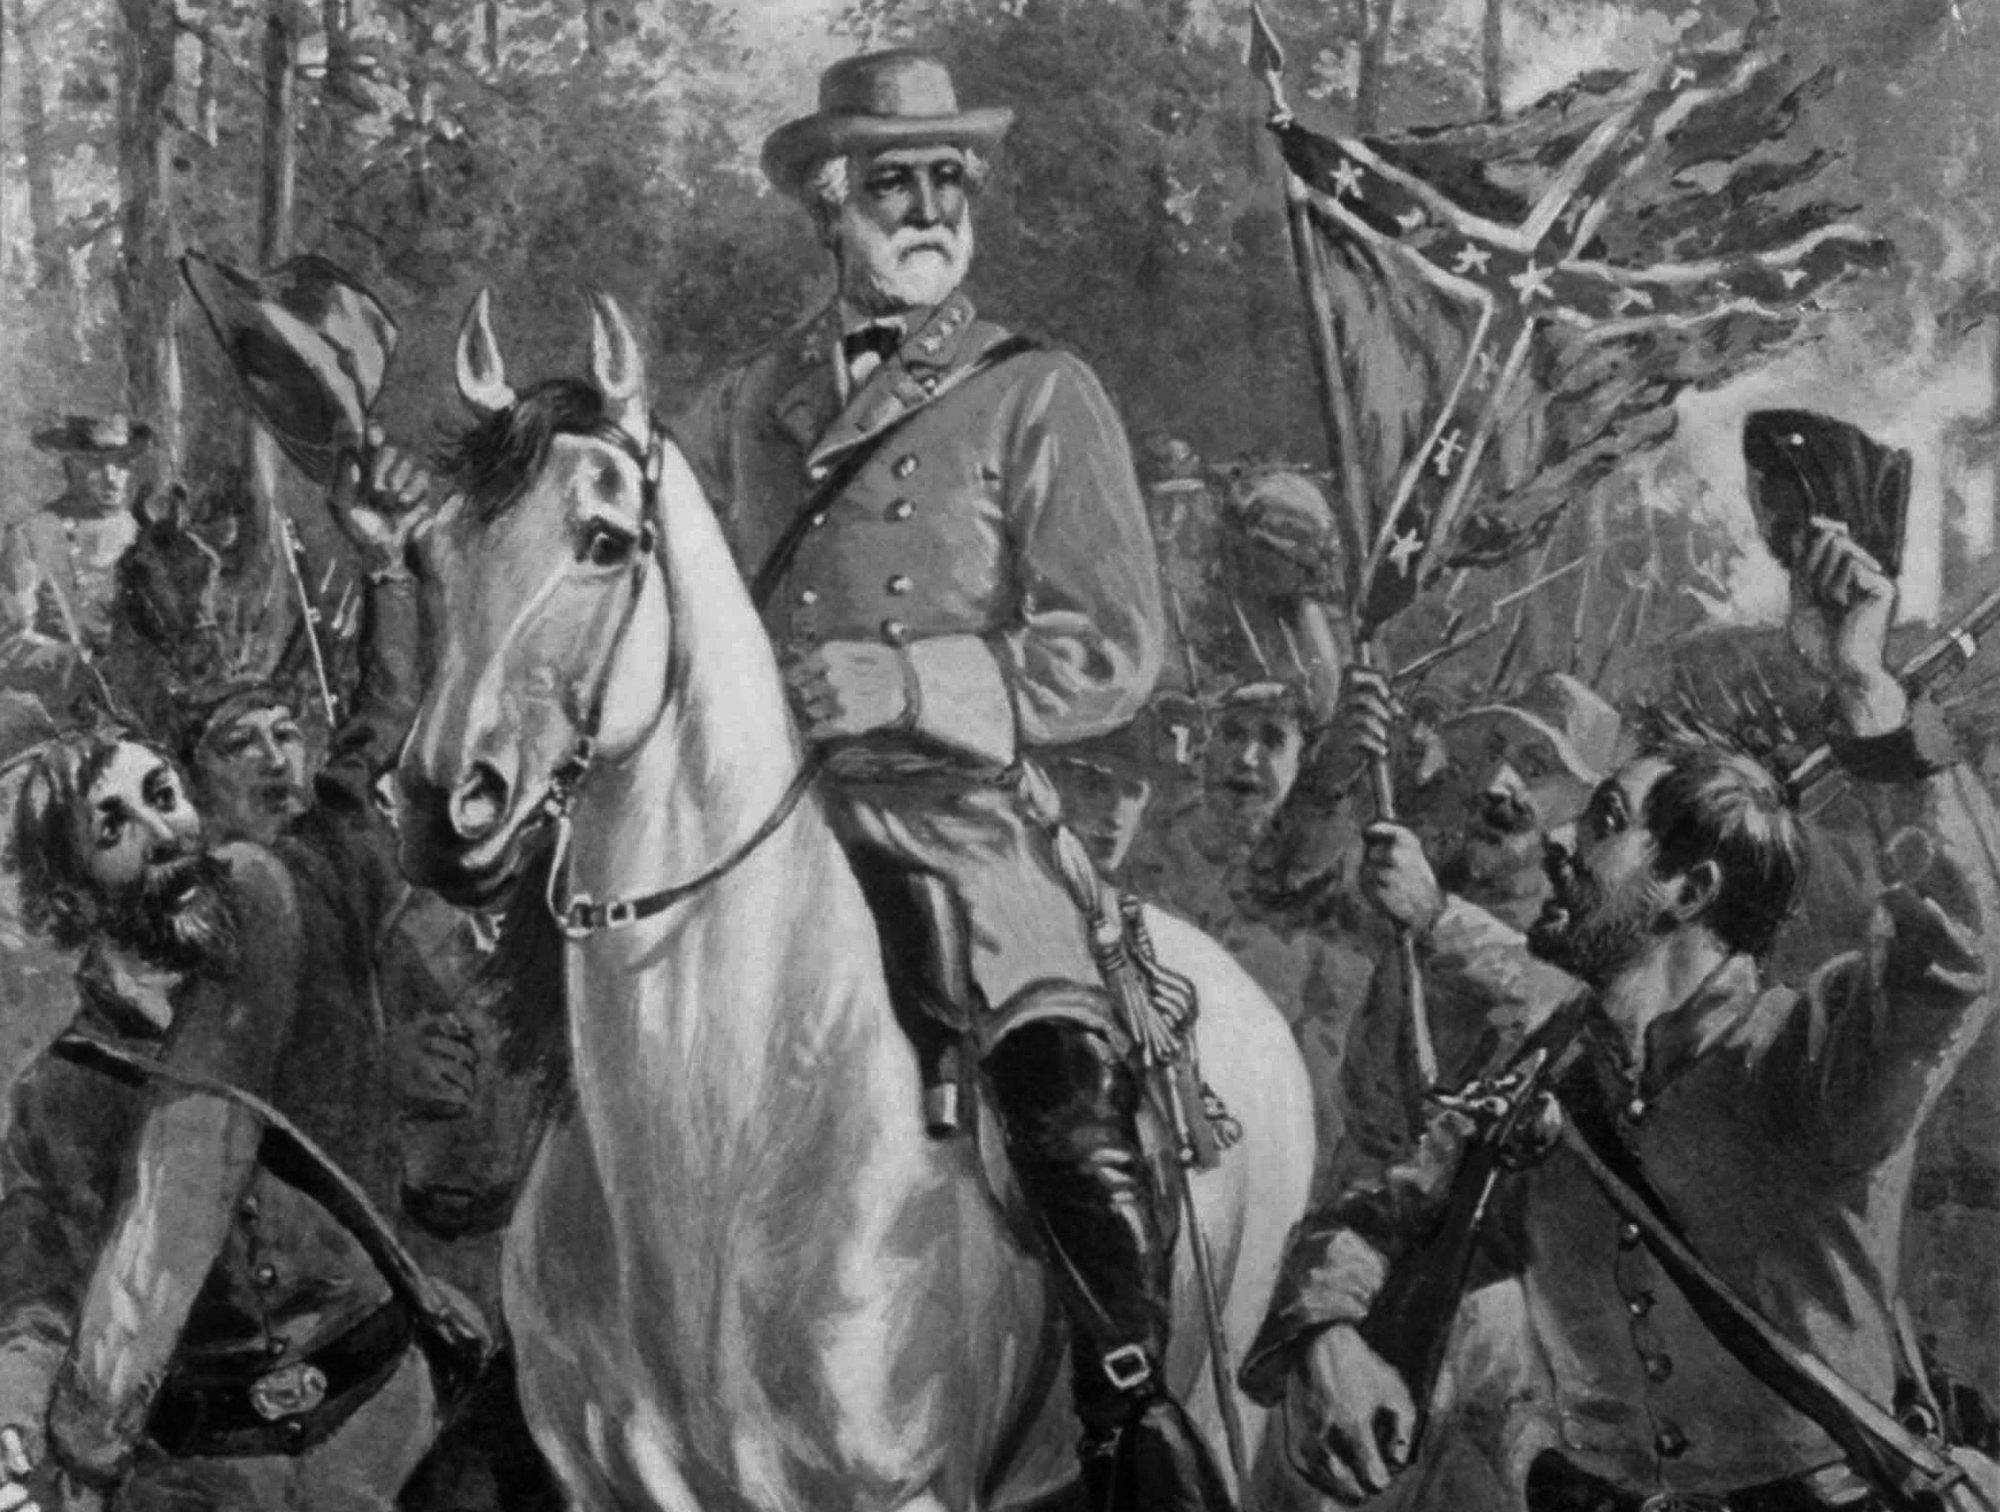 6 Robert E Lee Riding his famous White Horse